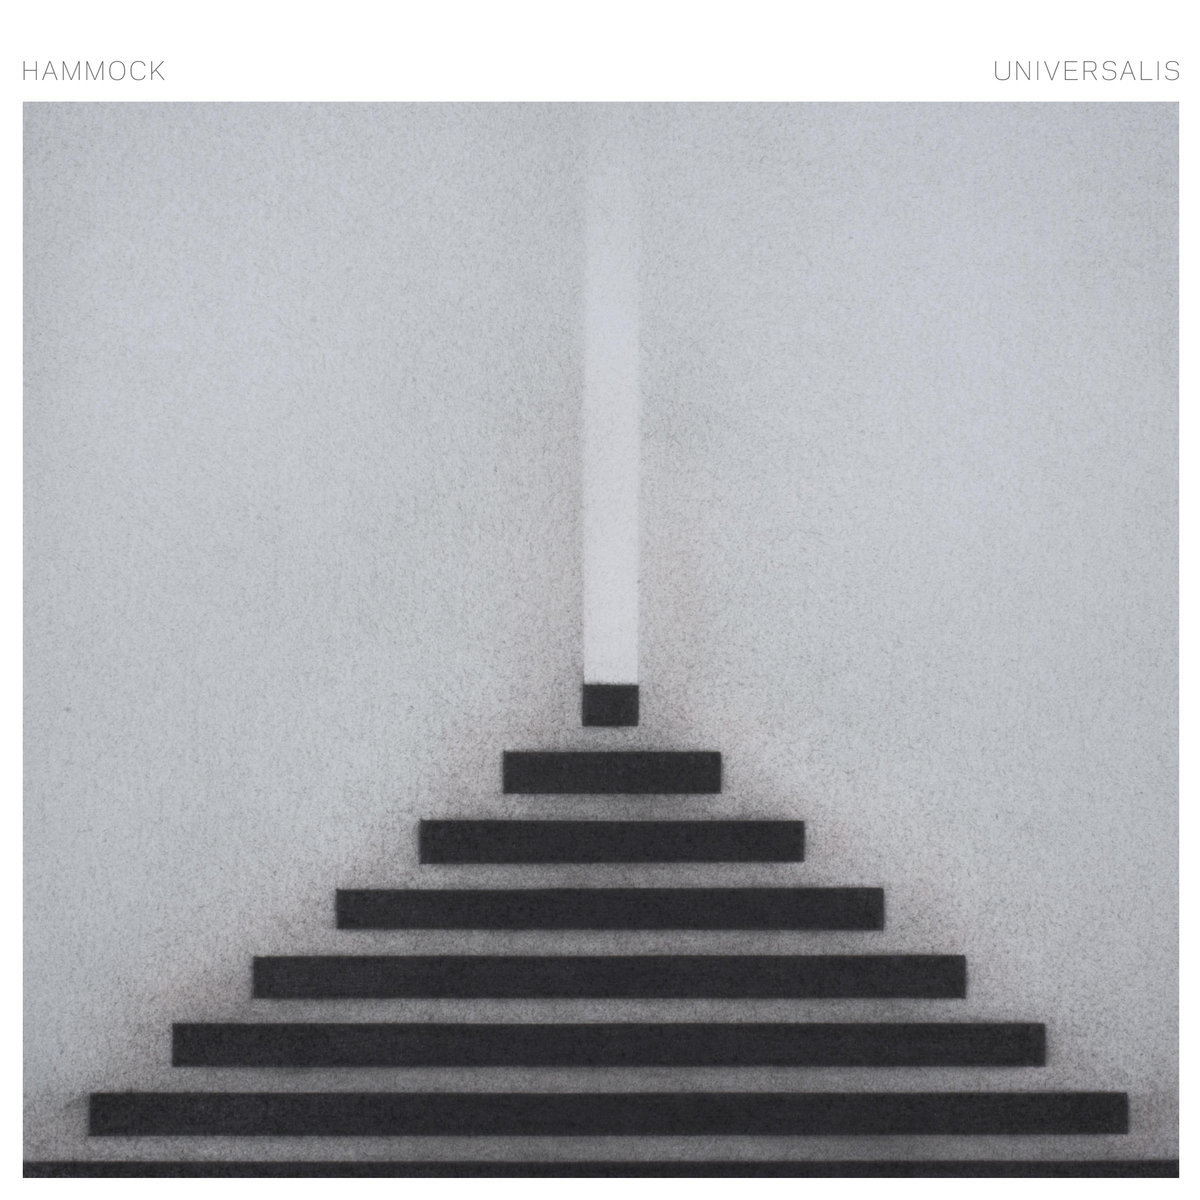 Hammock「Universalis」(Hammock Music)